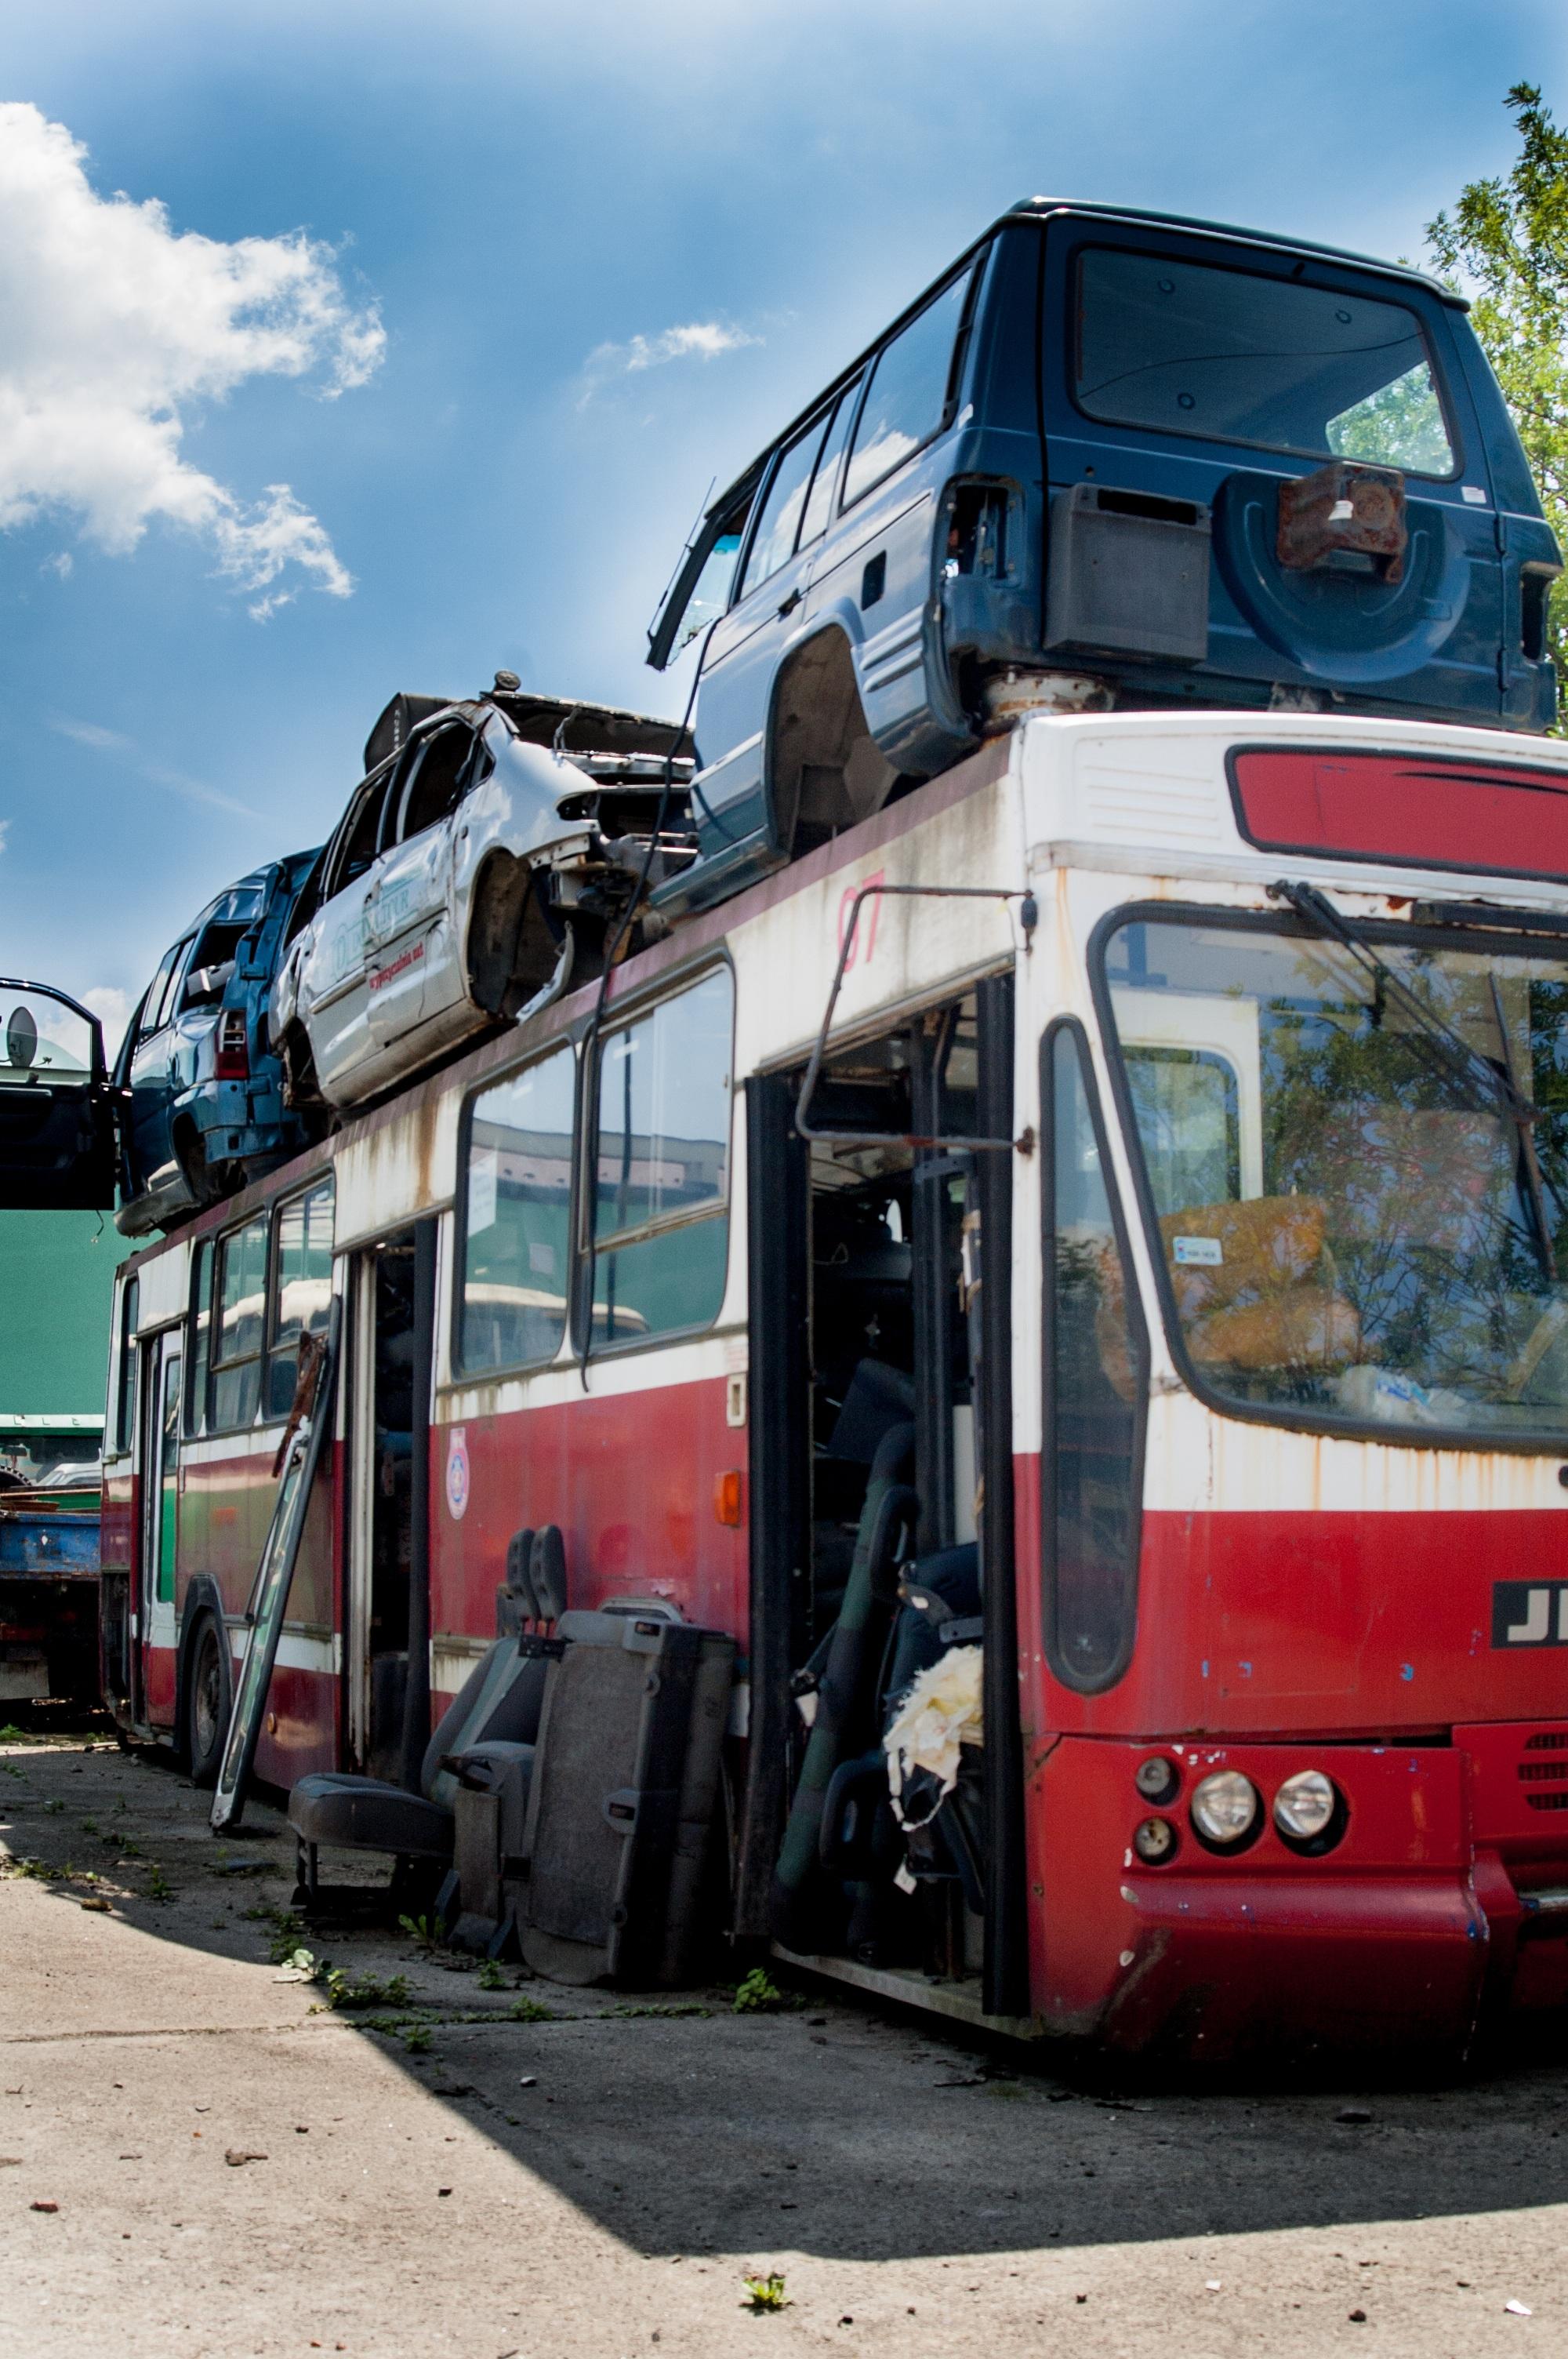 Free Images : red, old car, public transport, bus, locomotive, cars ...